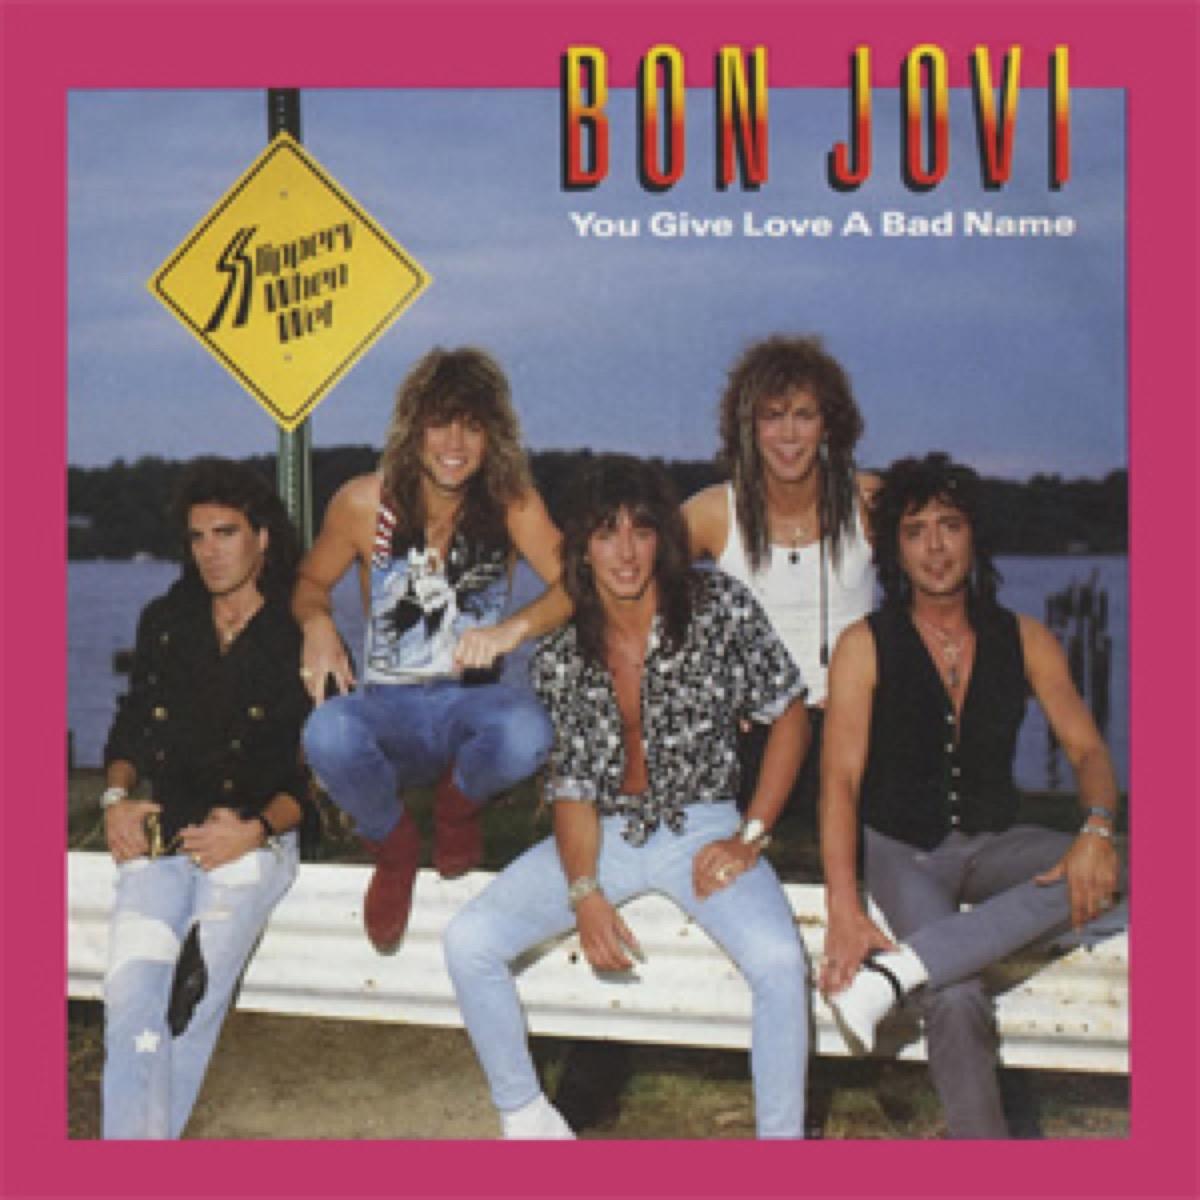 bon jovi you give love a bad name cover art, best breakup songs